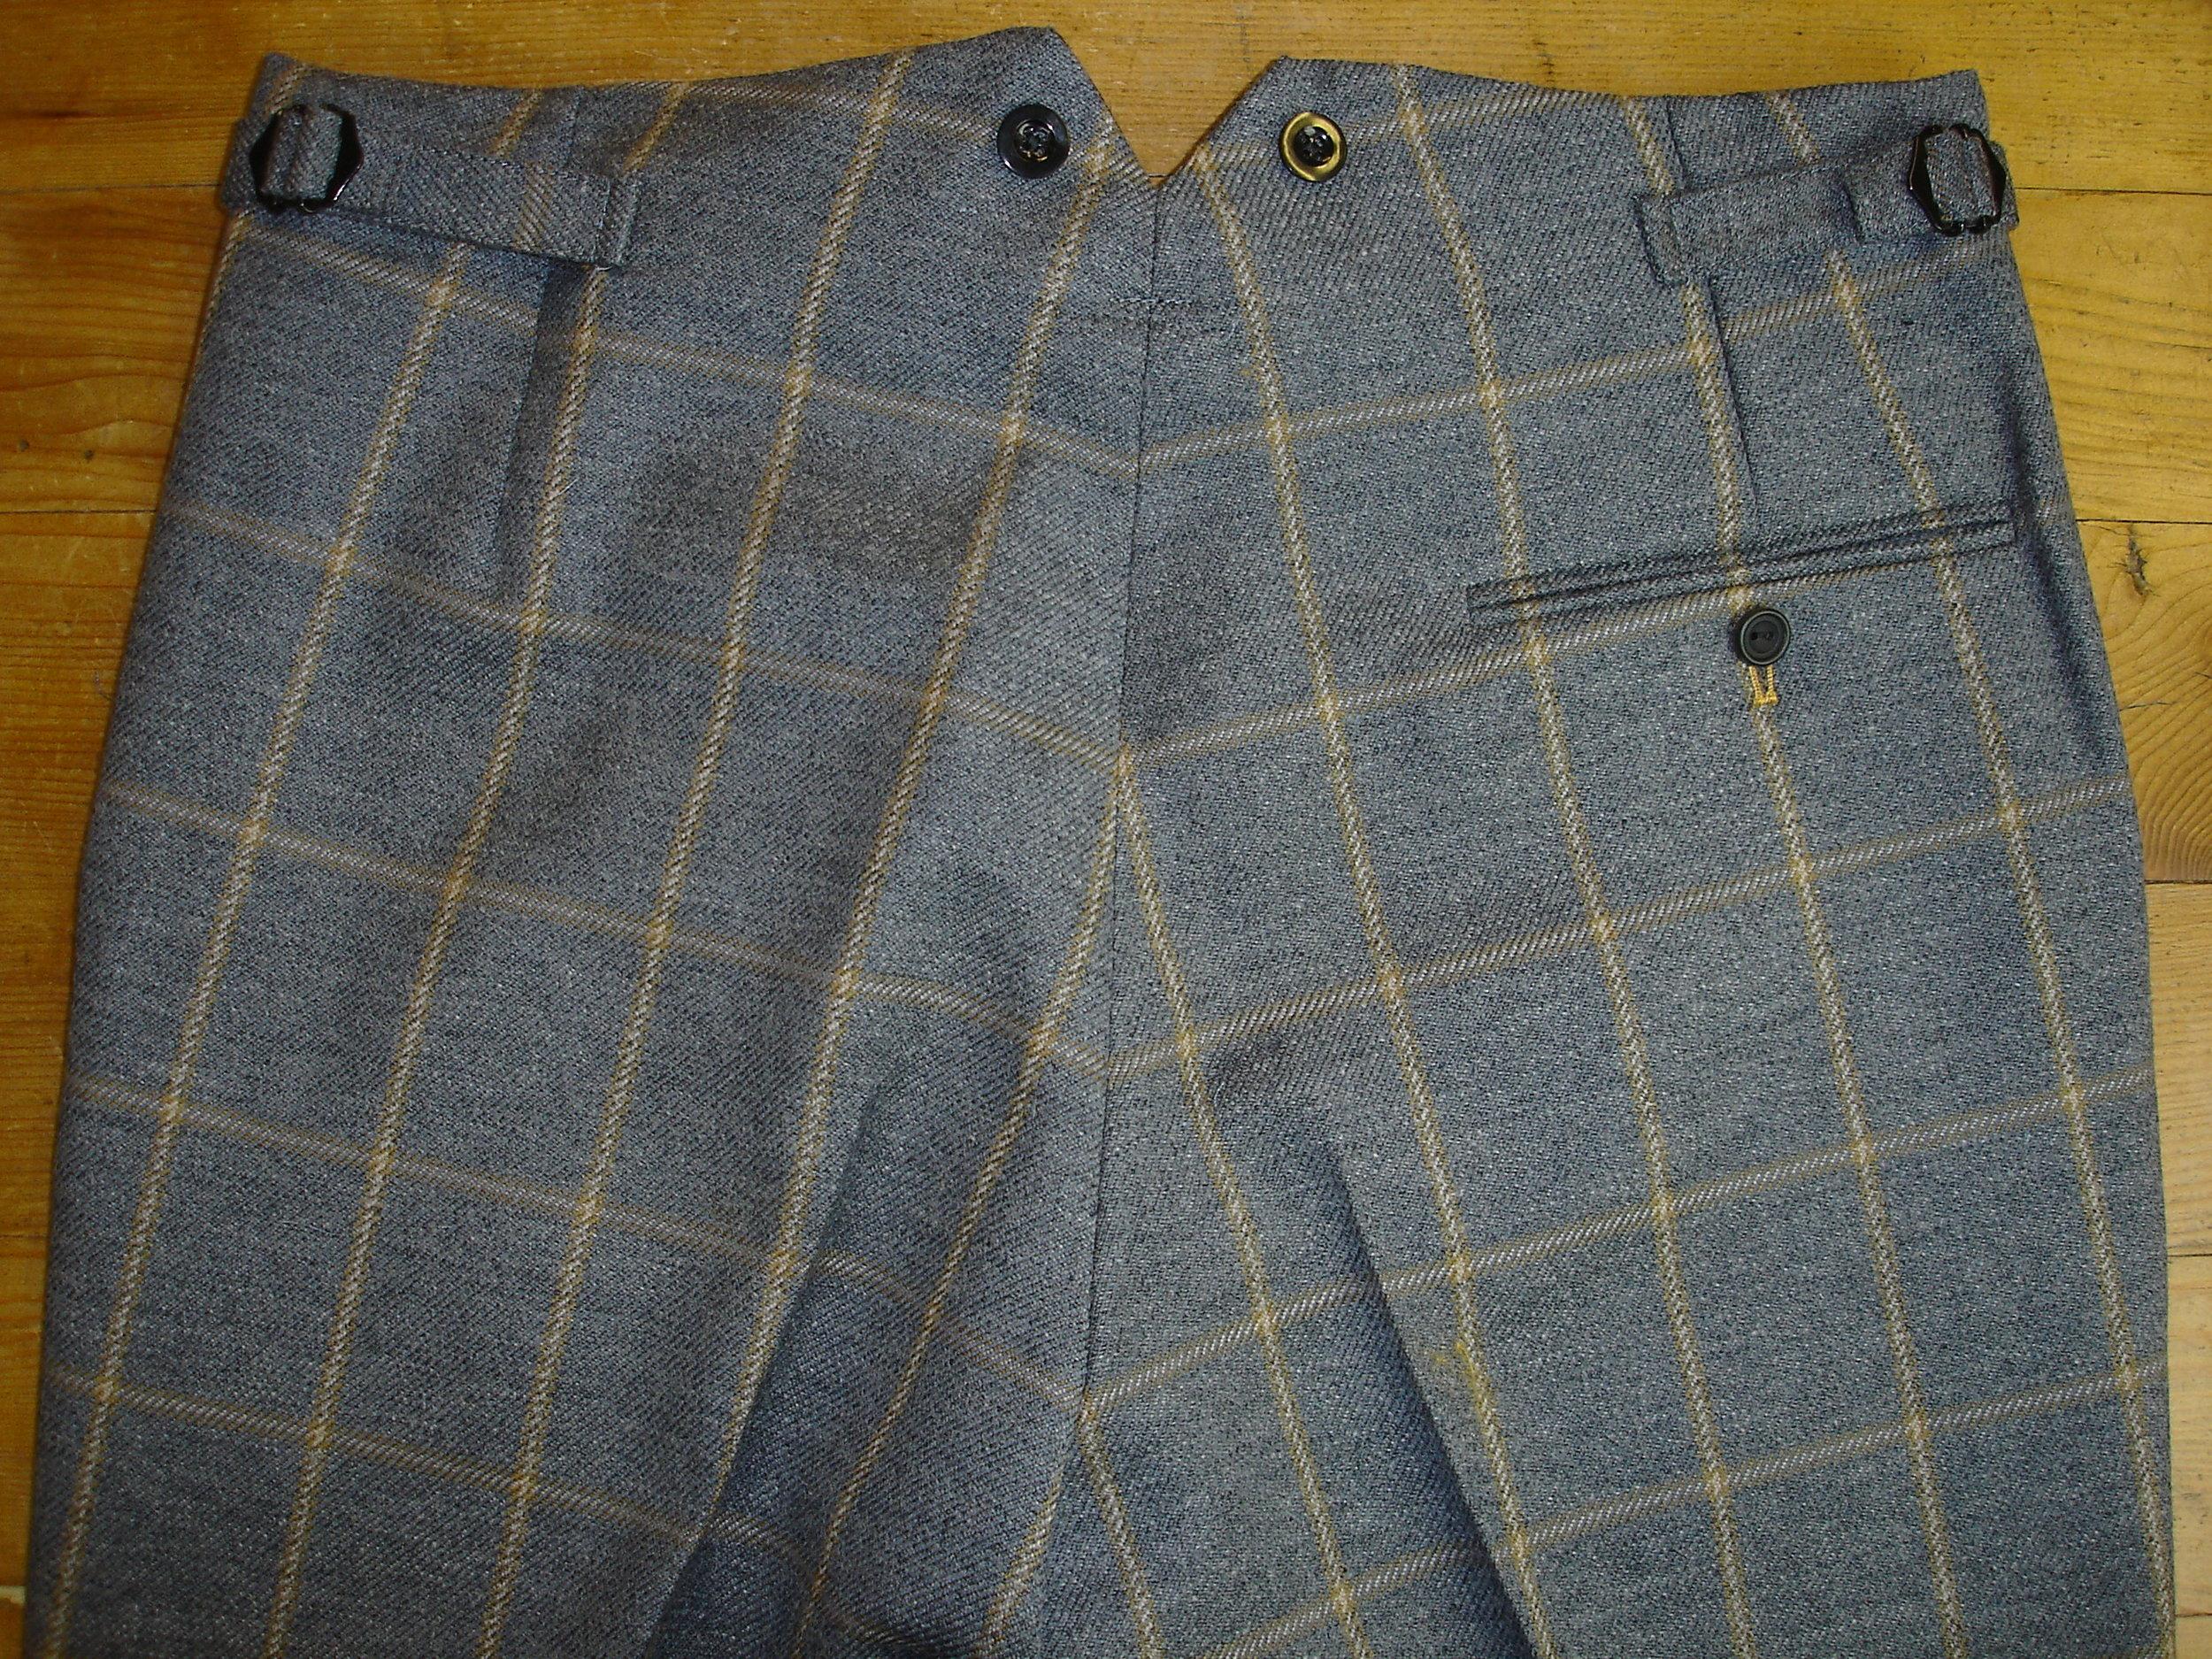 Glenhunt Grey Check 3 Piece Tweed Suit (16).JPG